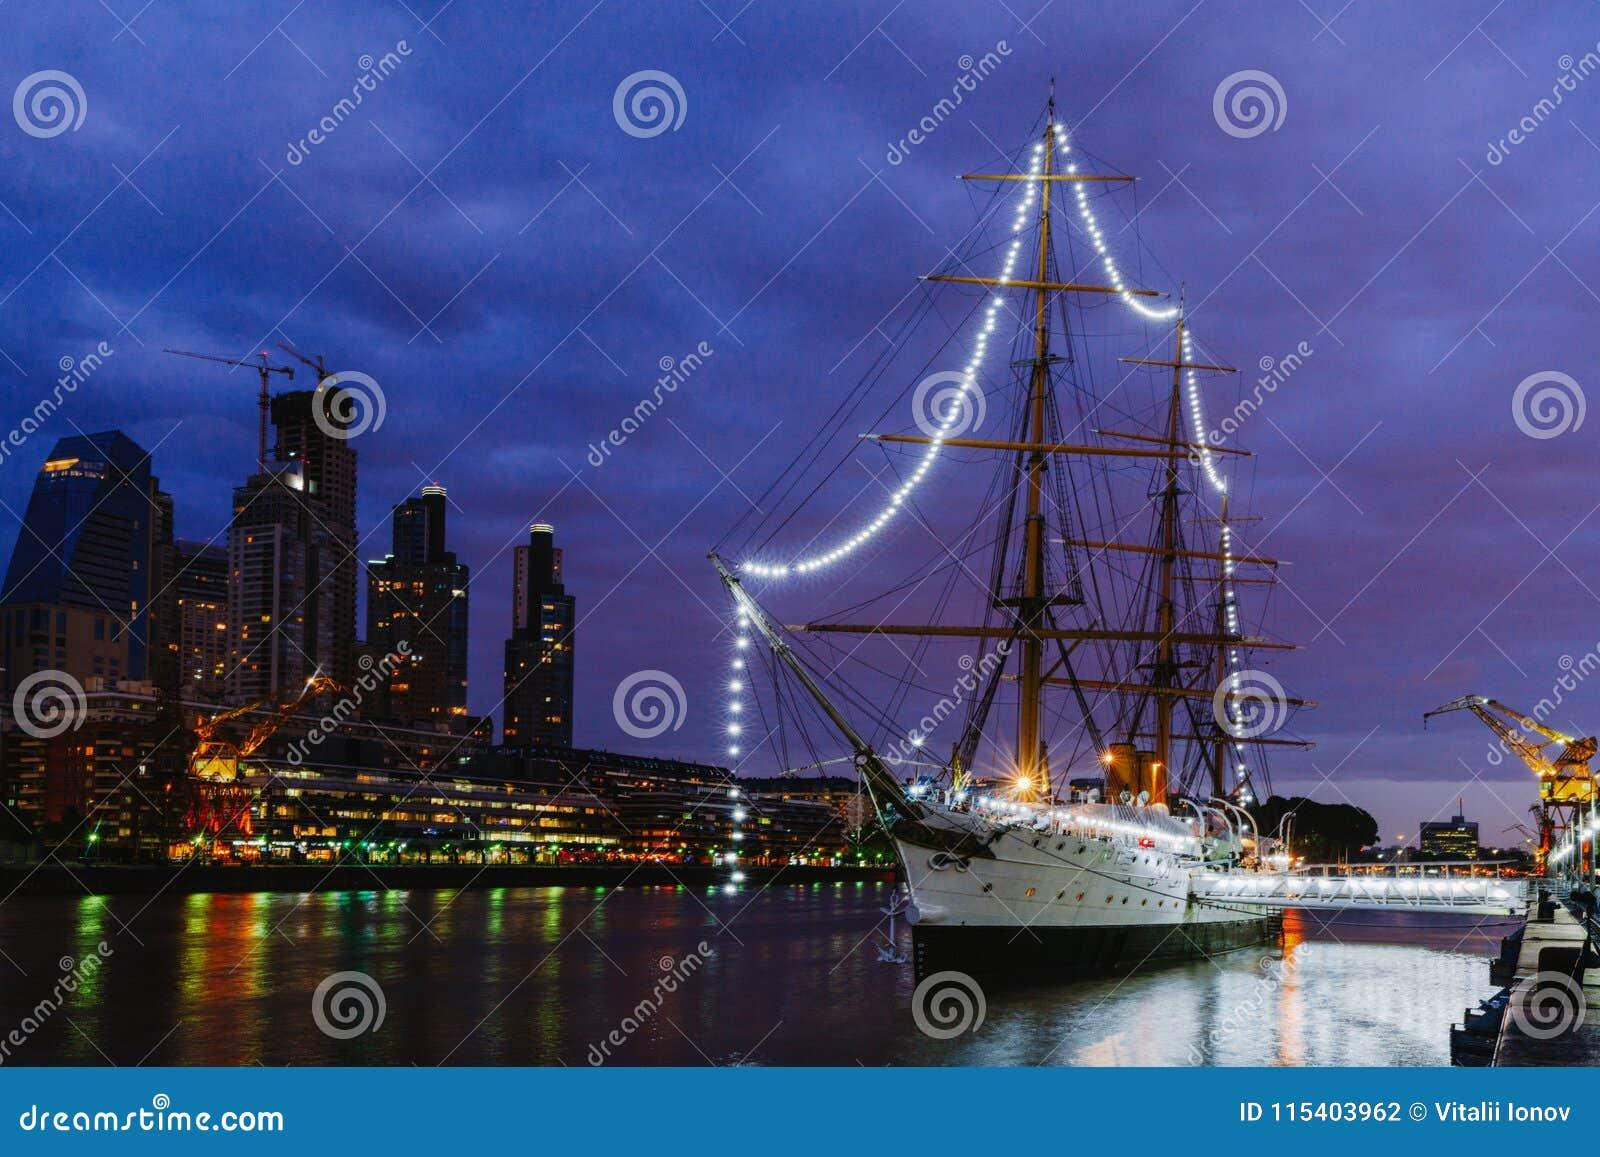 Fregat ARA Presidente Sarmiento - schipmuseum in het centrum van Buenos aires